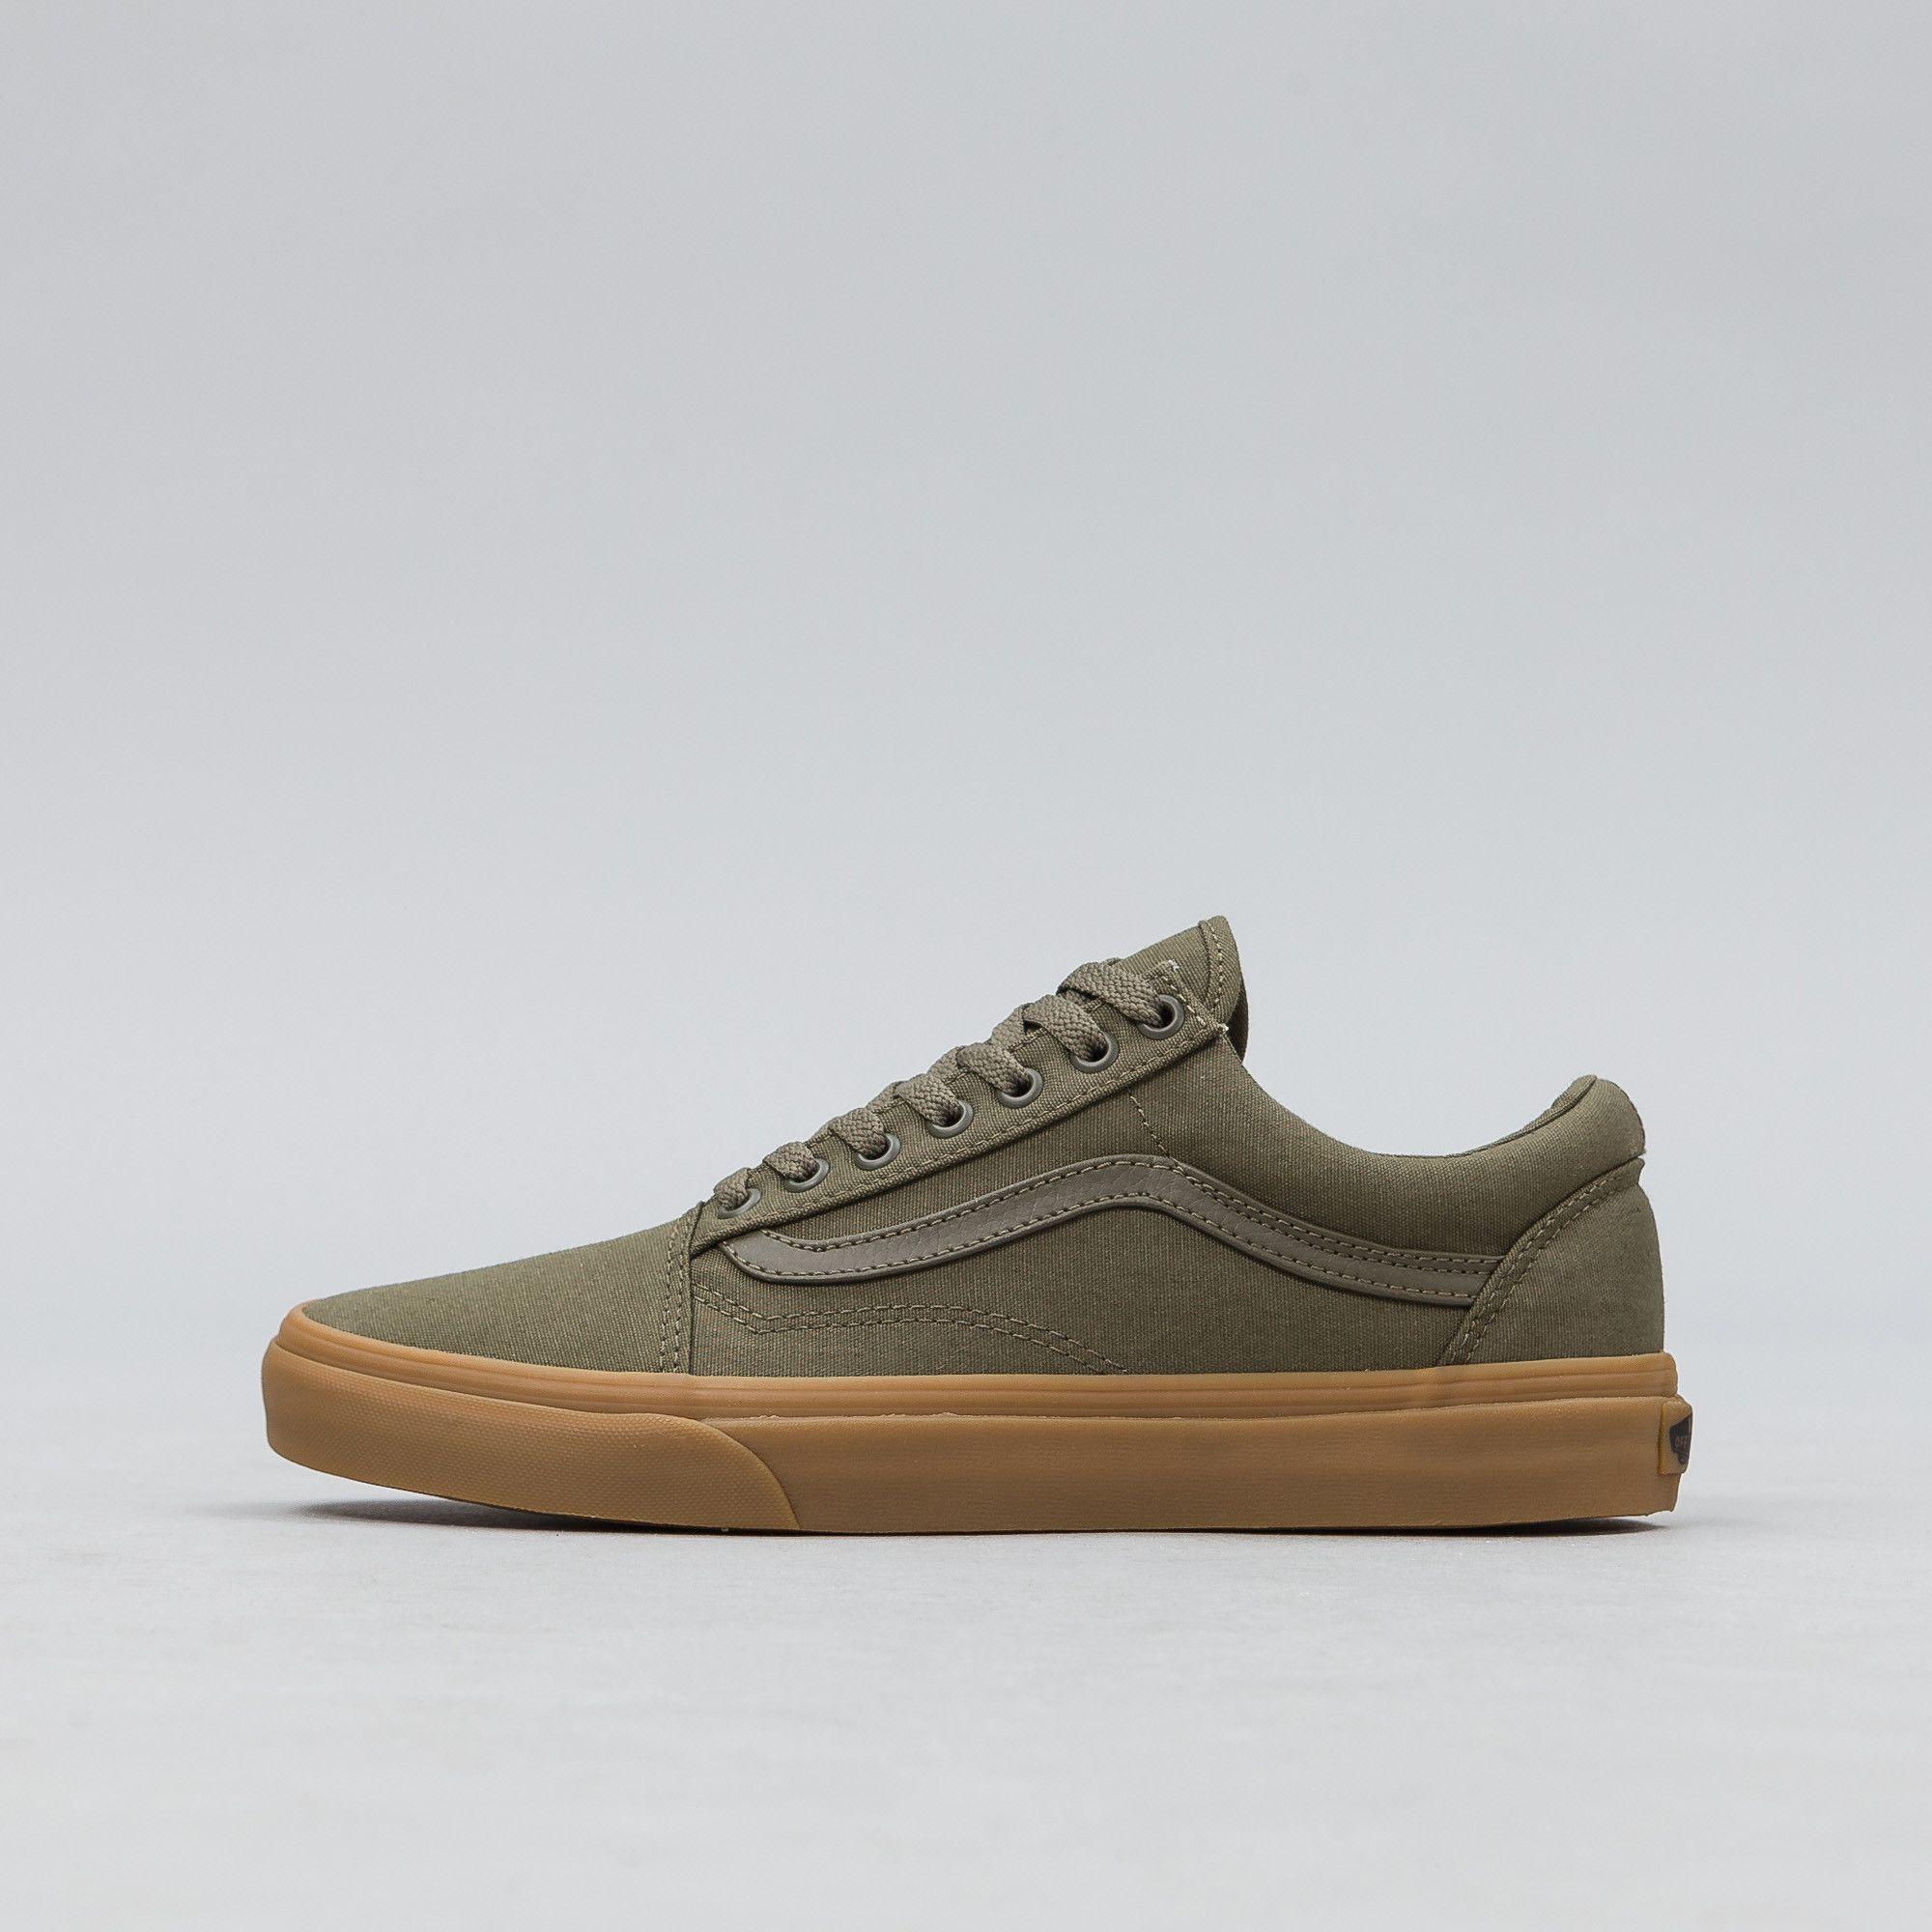 Canvas Gum Old Skool in Ivy Green | Sneakers men fashion